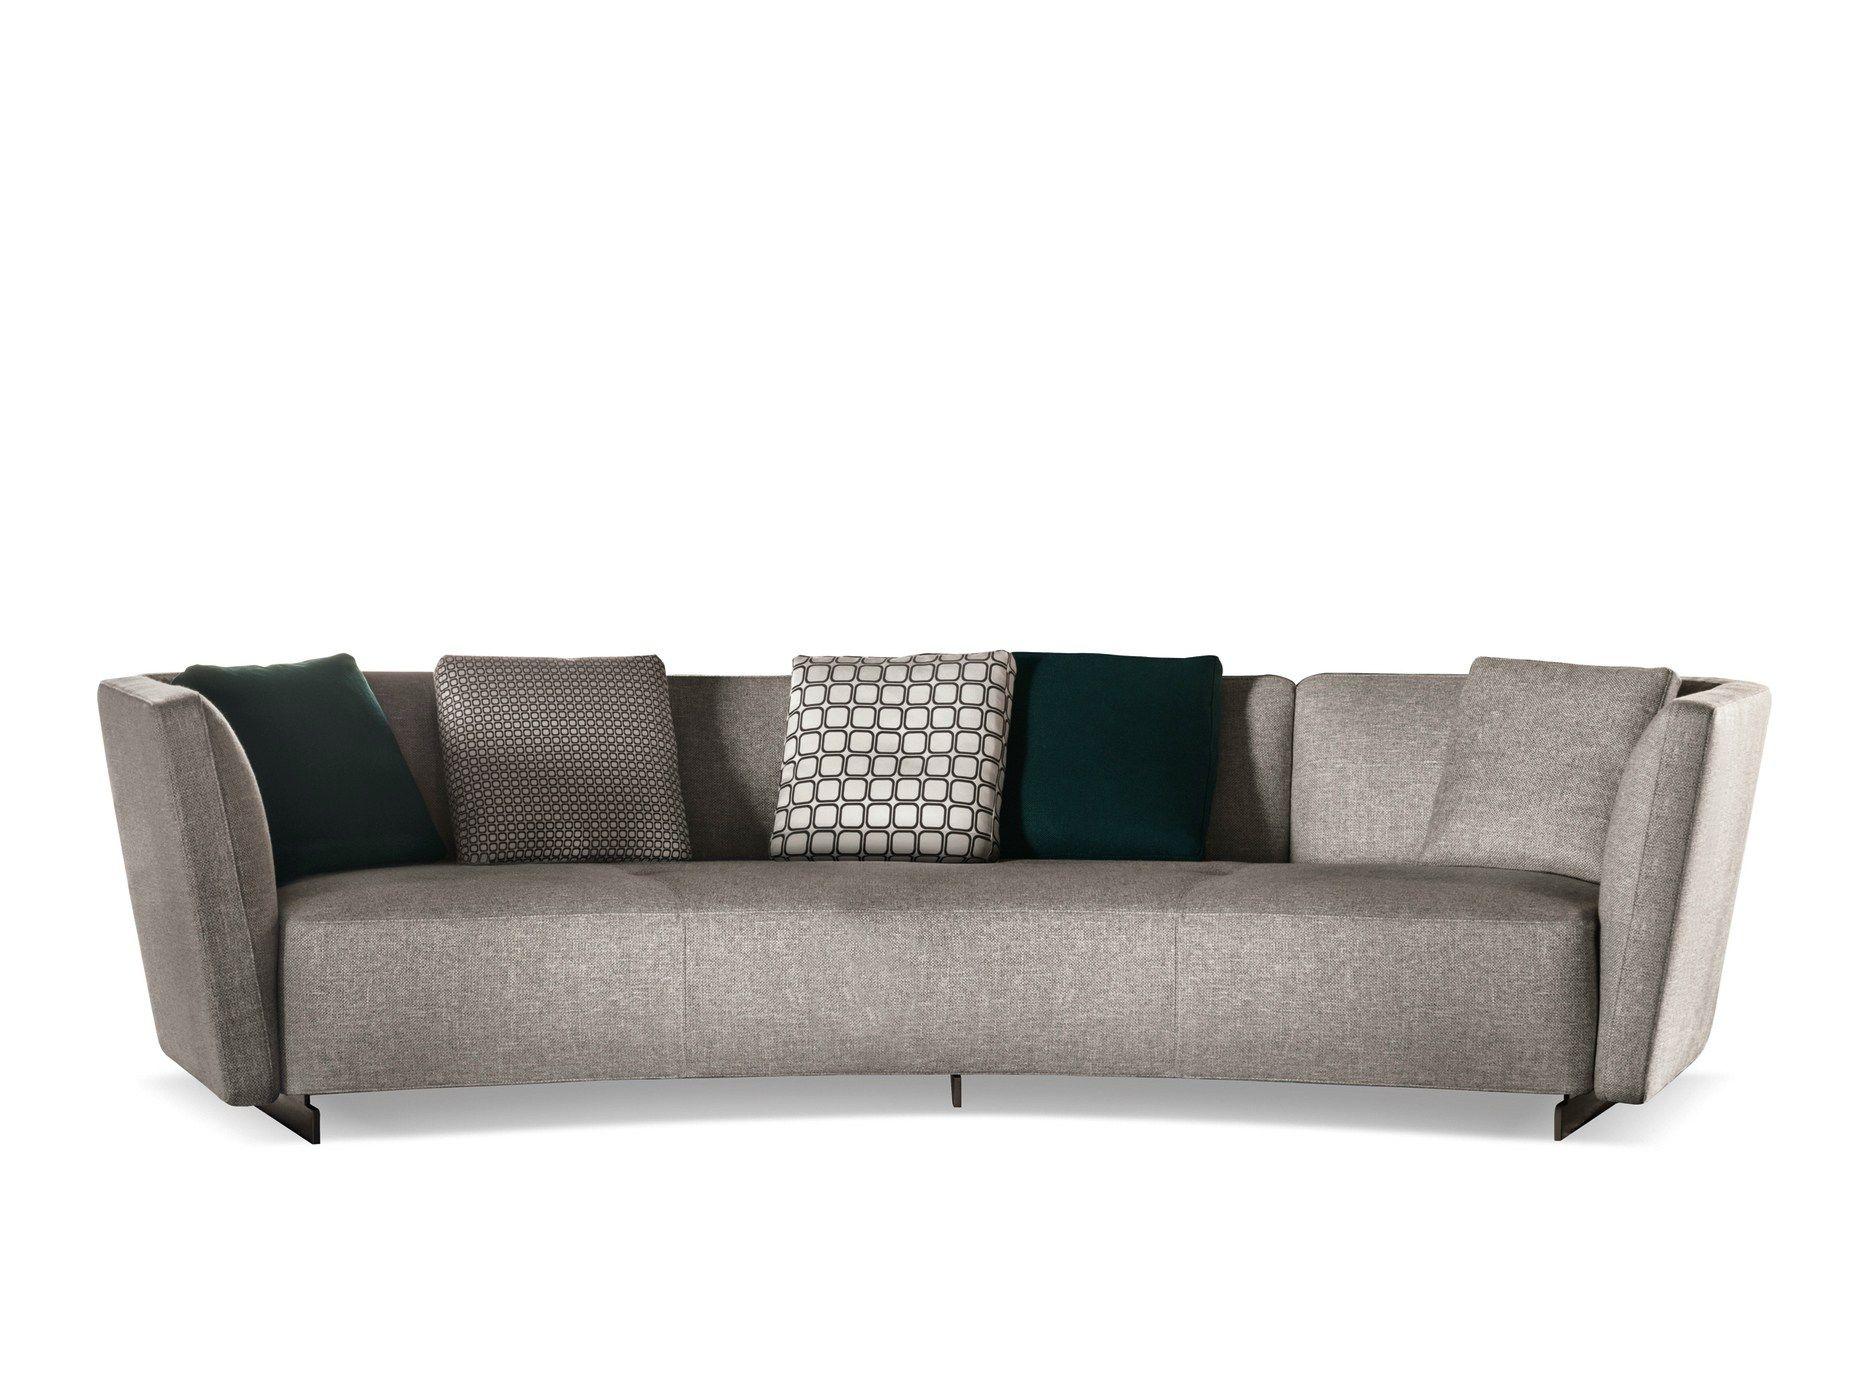 Seymour Seating System By Rodolfo Dordoni For Minotti Supreme Furniture Architecture Blog Round Sofa Sofa Design Upholstered Sofa